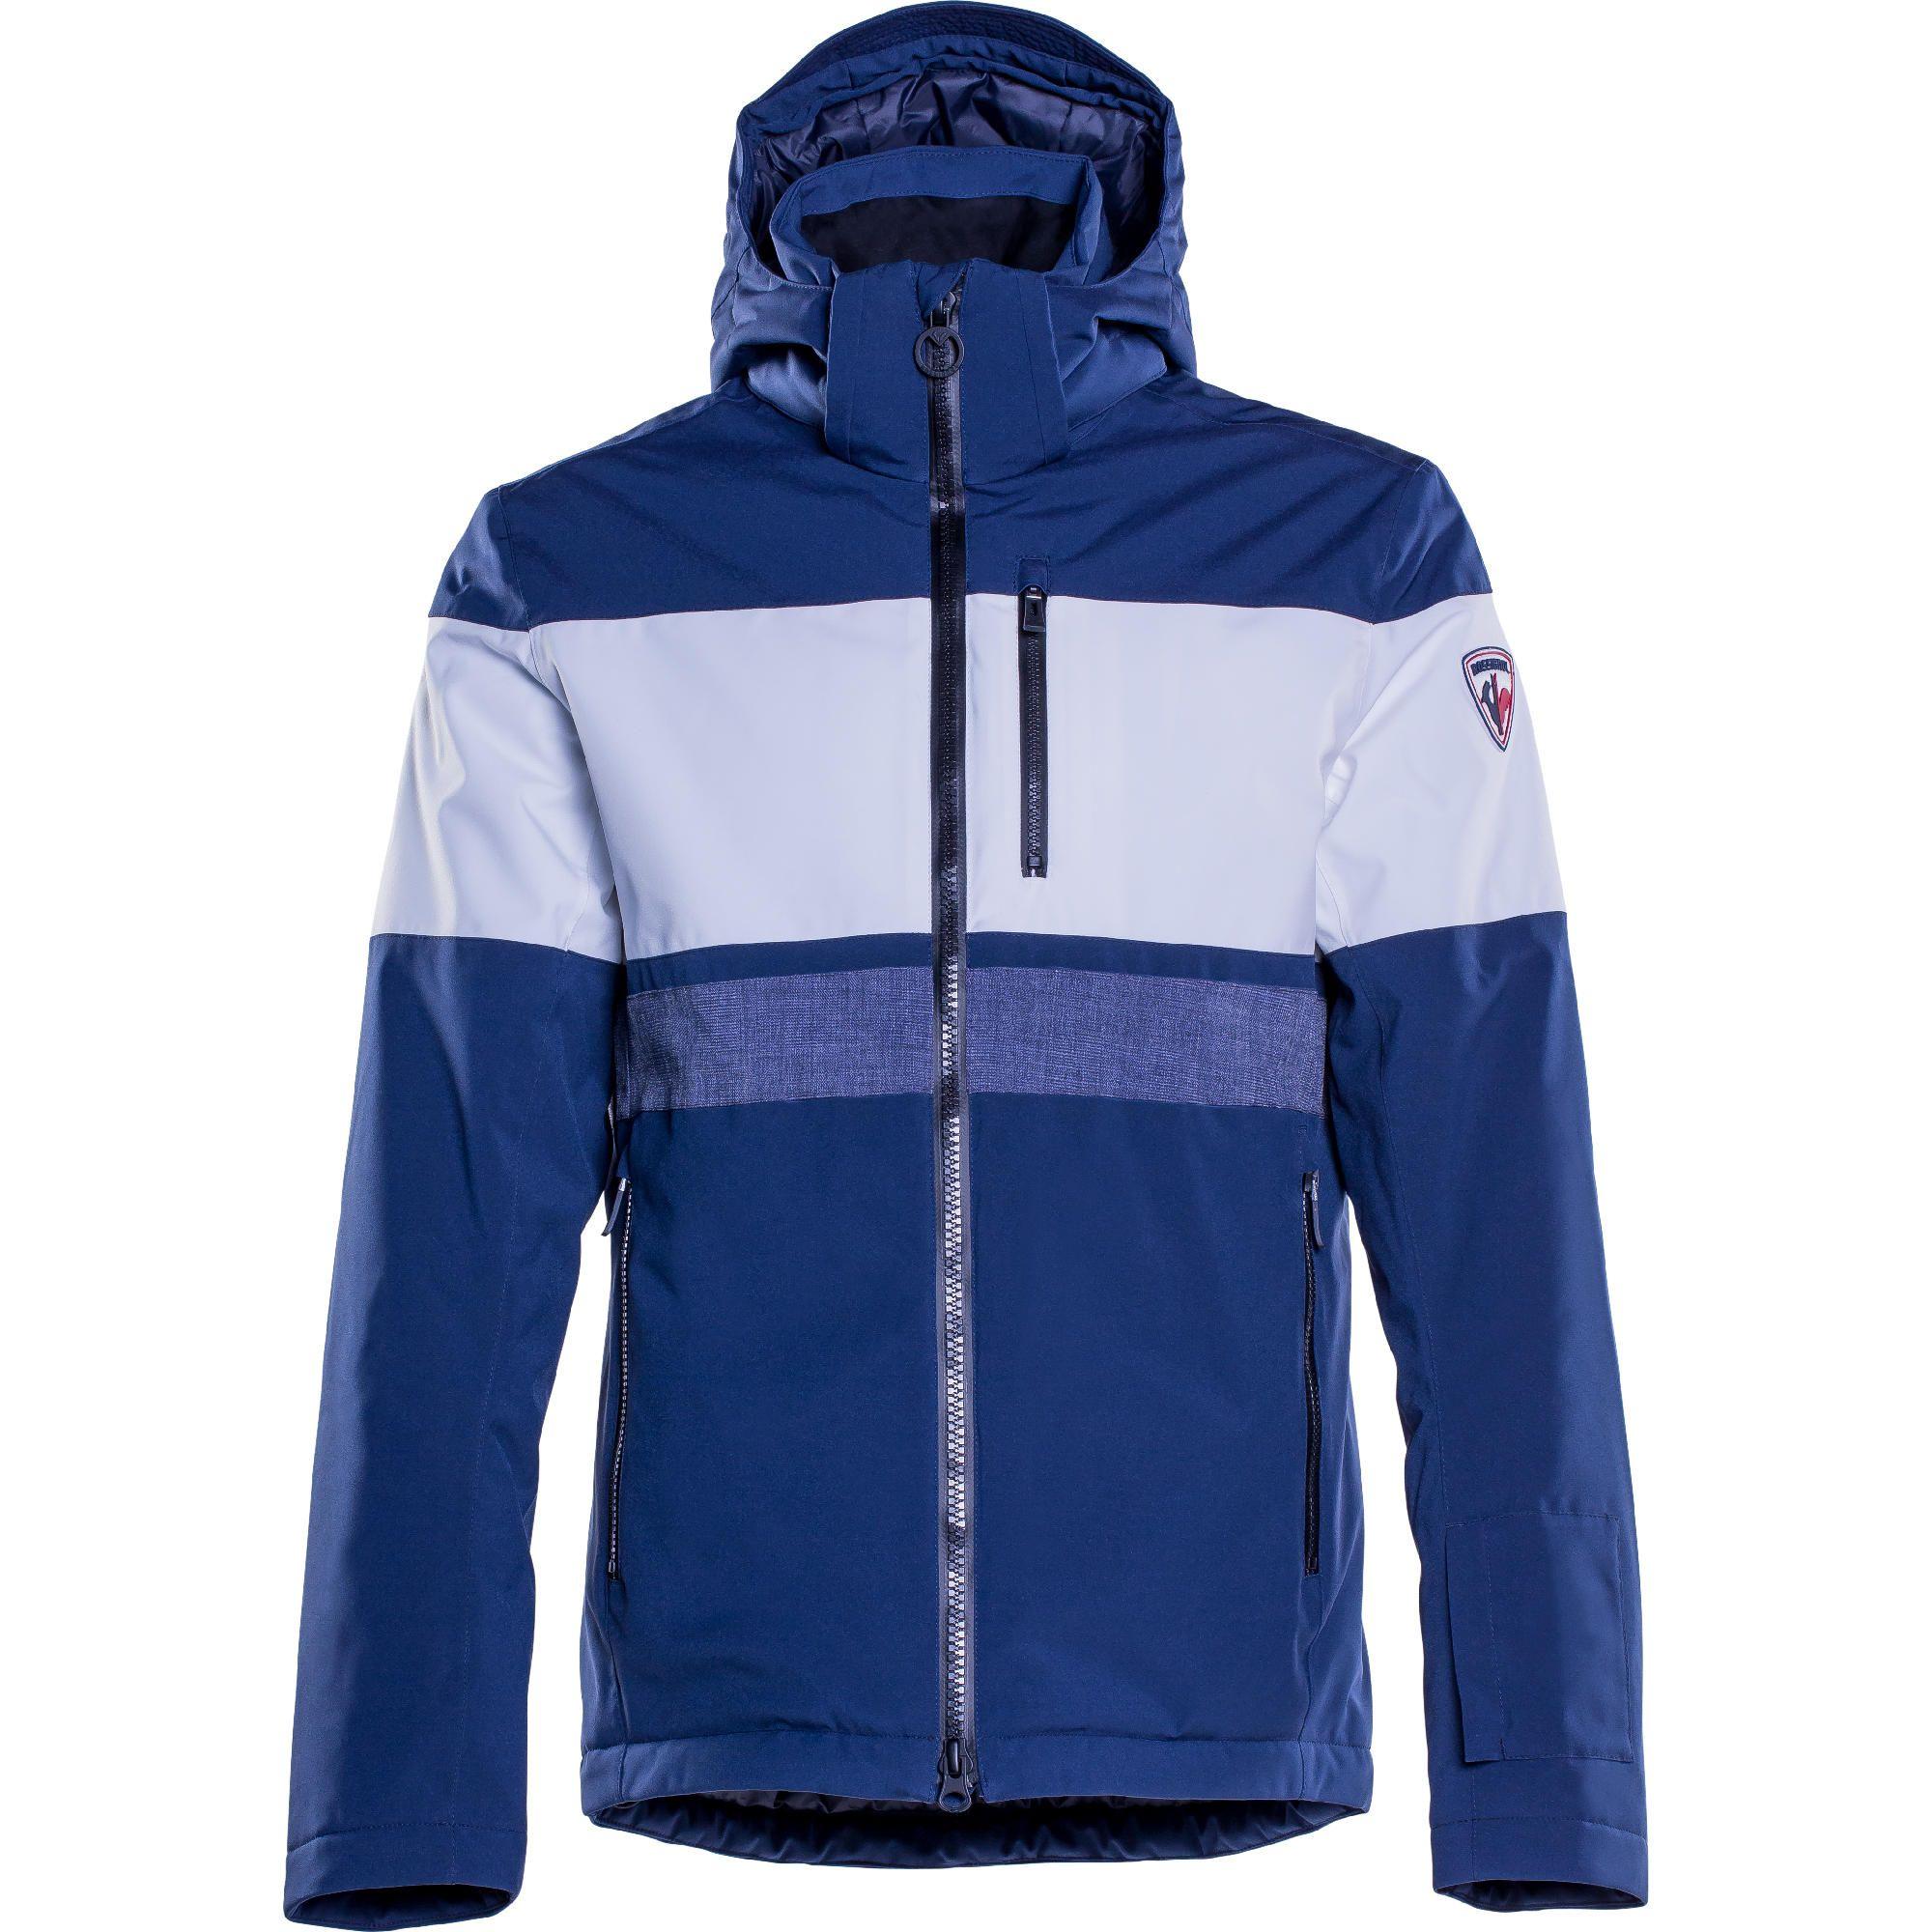 rossignol sideral jacket ski jackets clothing apparel rossignol xersion msx pinterest. Black Bedroom Furniture Sets. Home Design Ideas